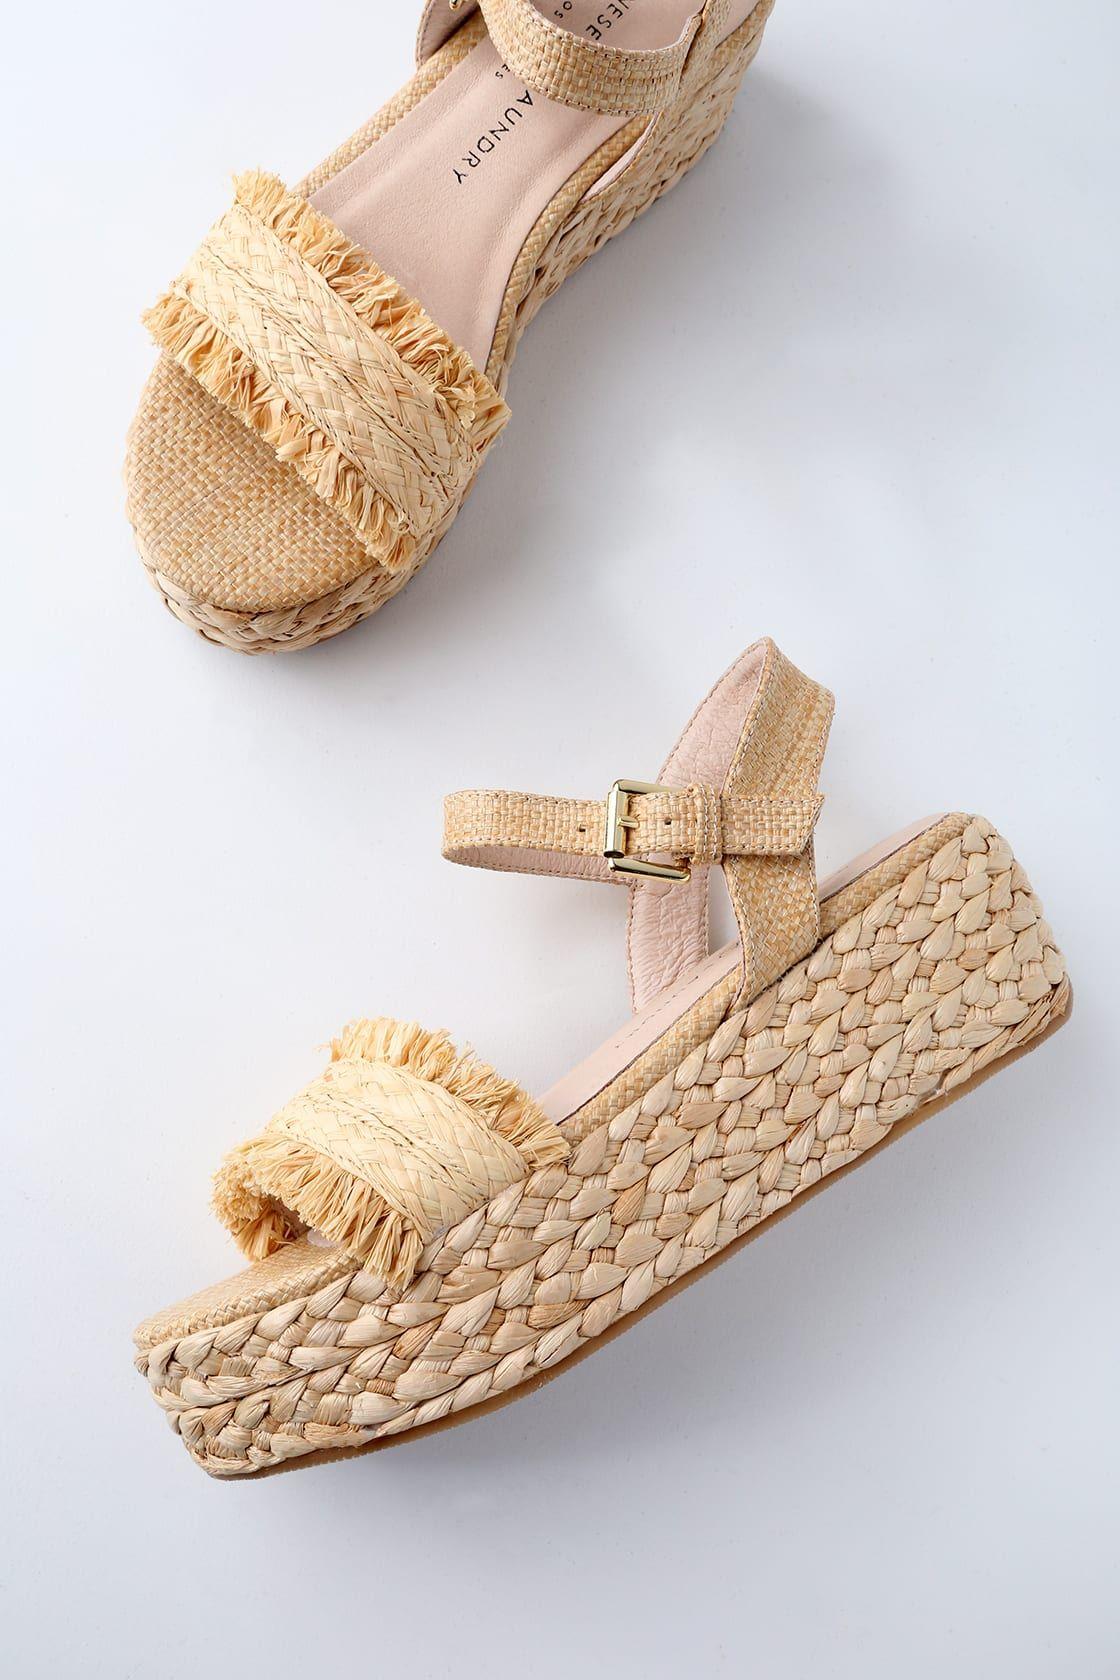 Ziba Natural Straw Flatform Sandals | Flatform sandals, Cute shoes, Nice shoes